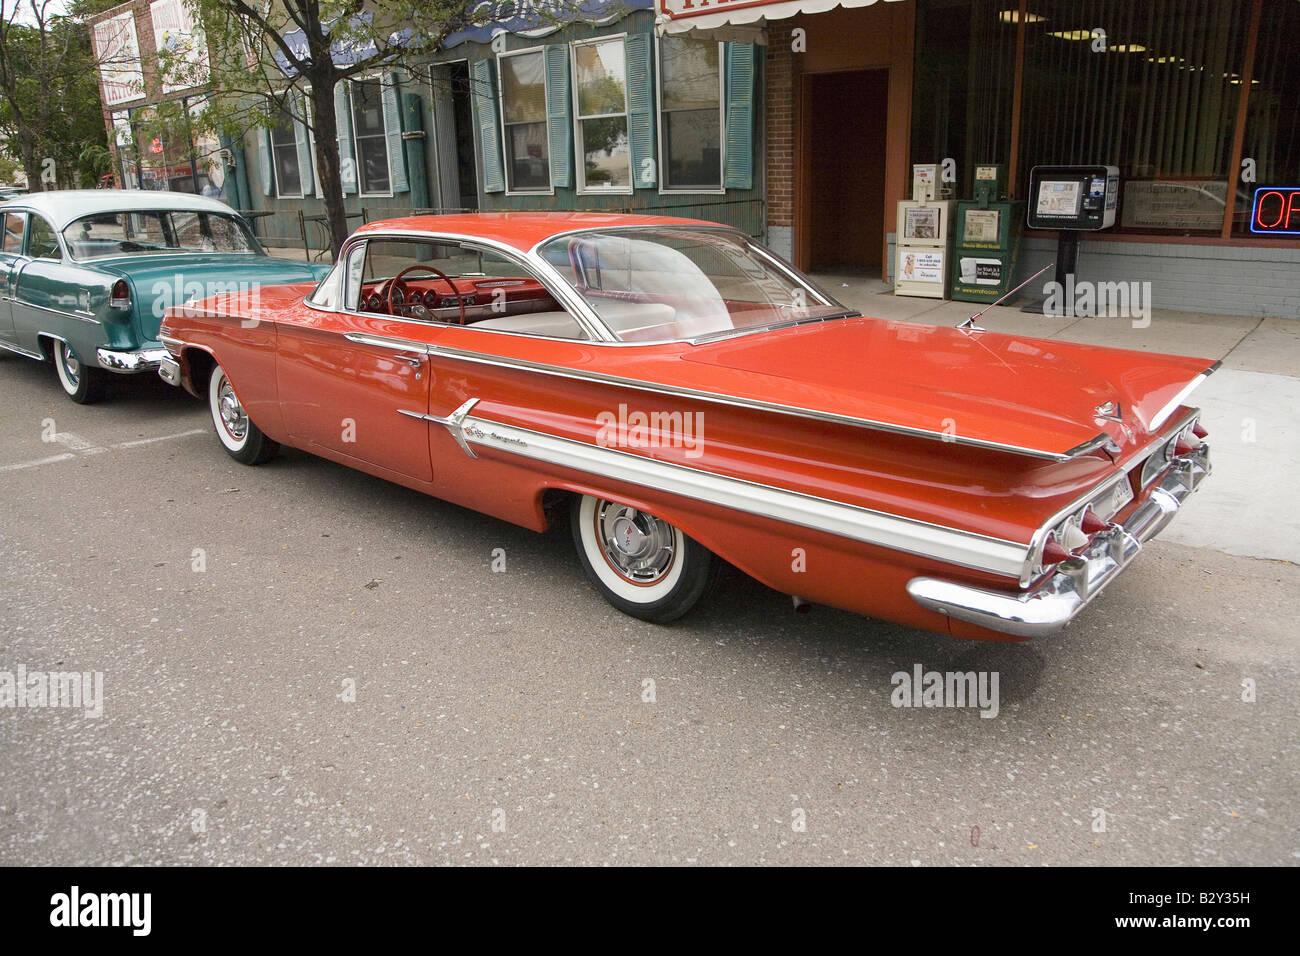 1961 Chevy Impala Stock Photos Images Alamy Ss Restored Red Grand Island Nebraska Image